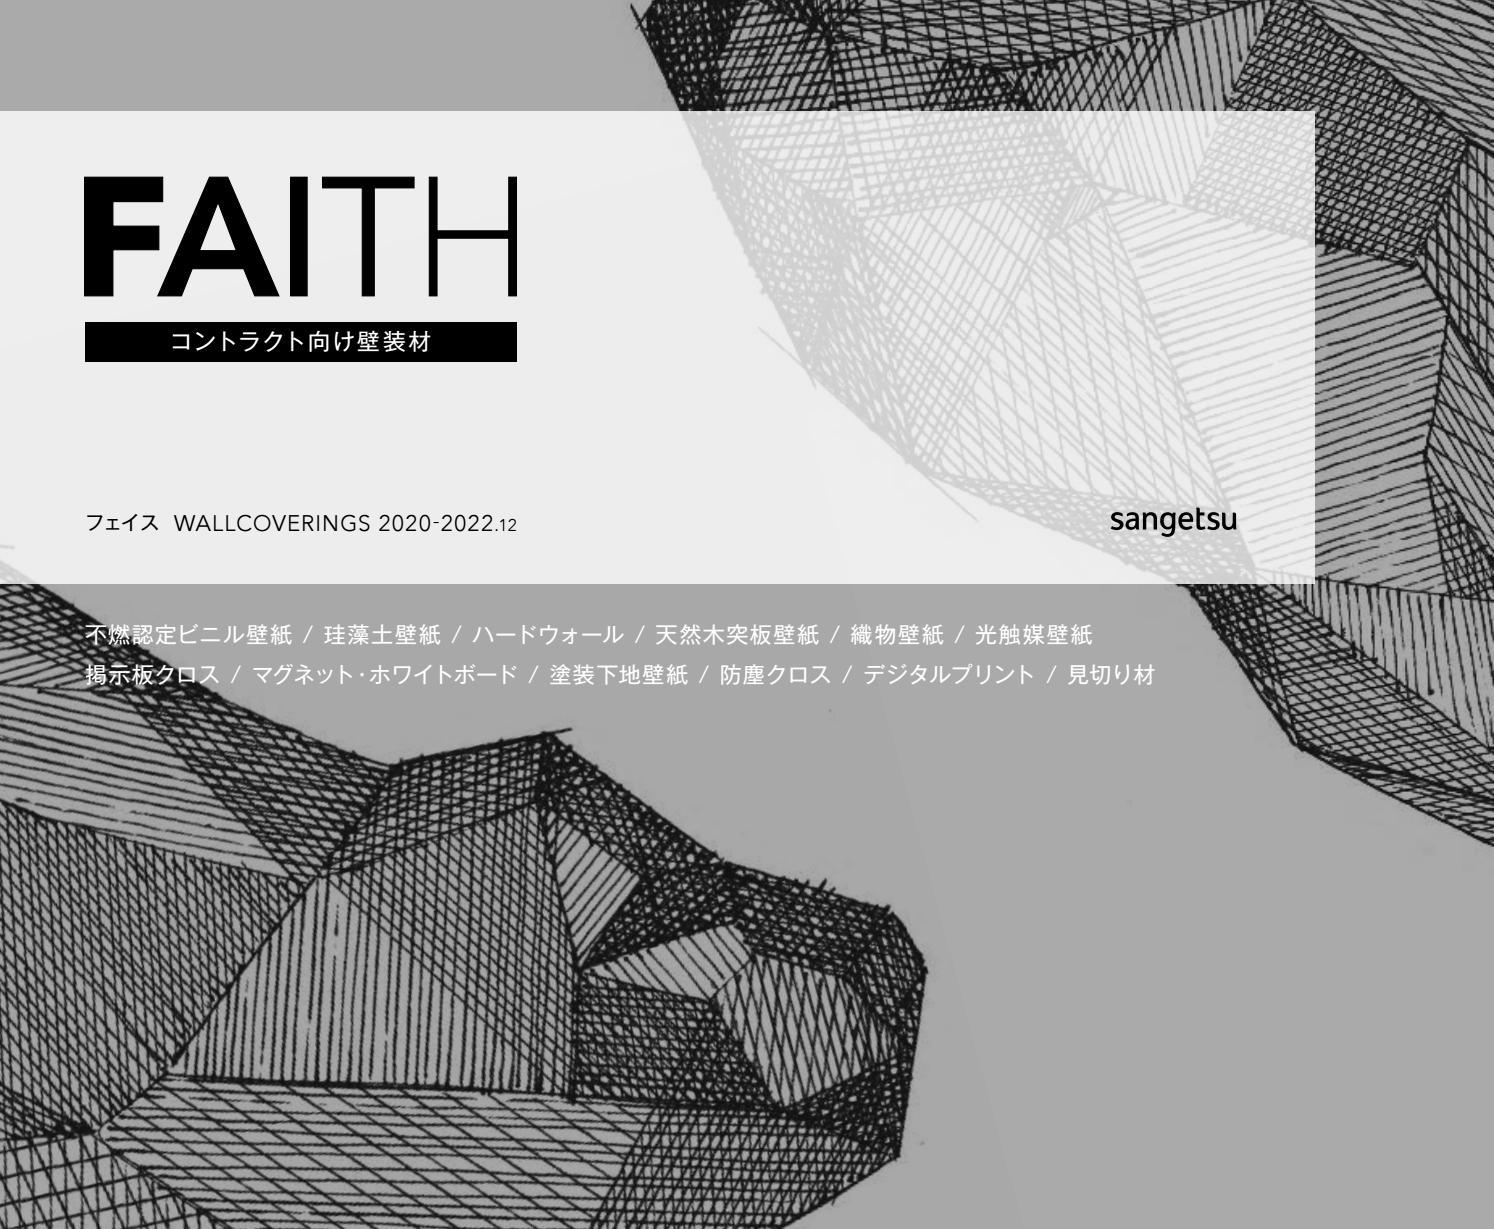 Faith 2020 23 By Goodrich Global Issuu